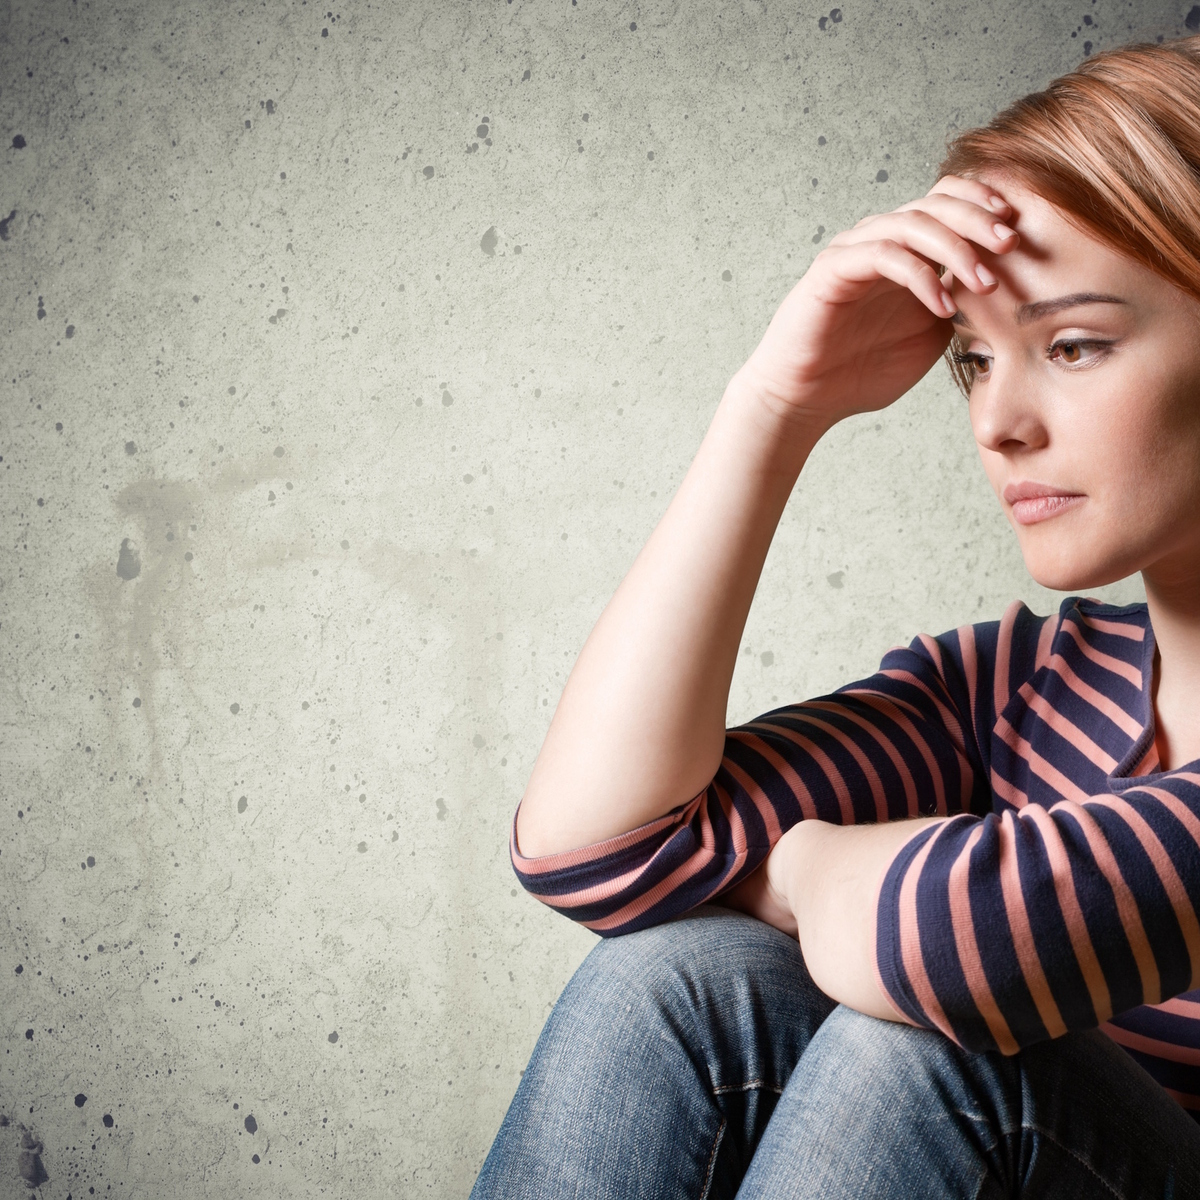 teen depression essays